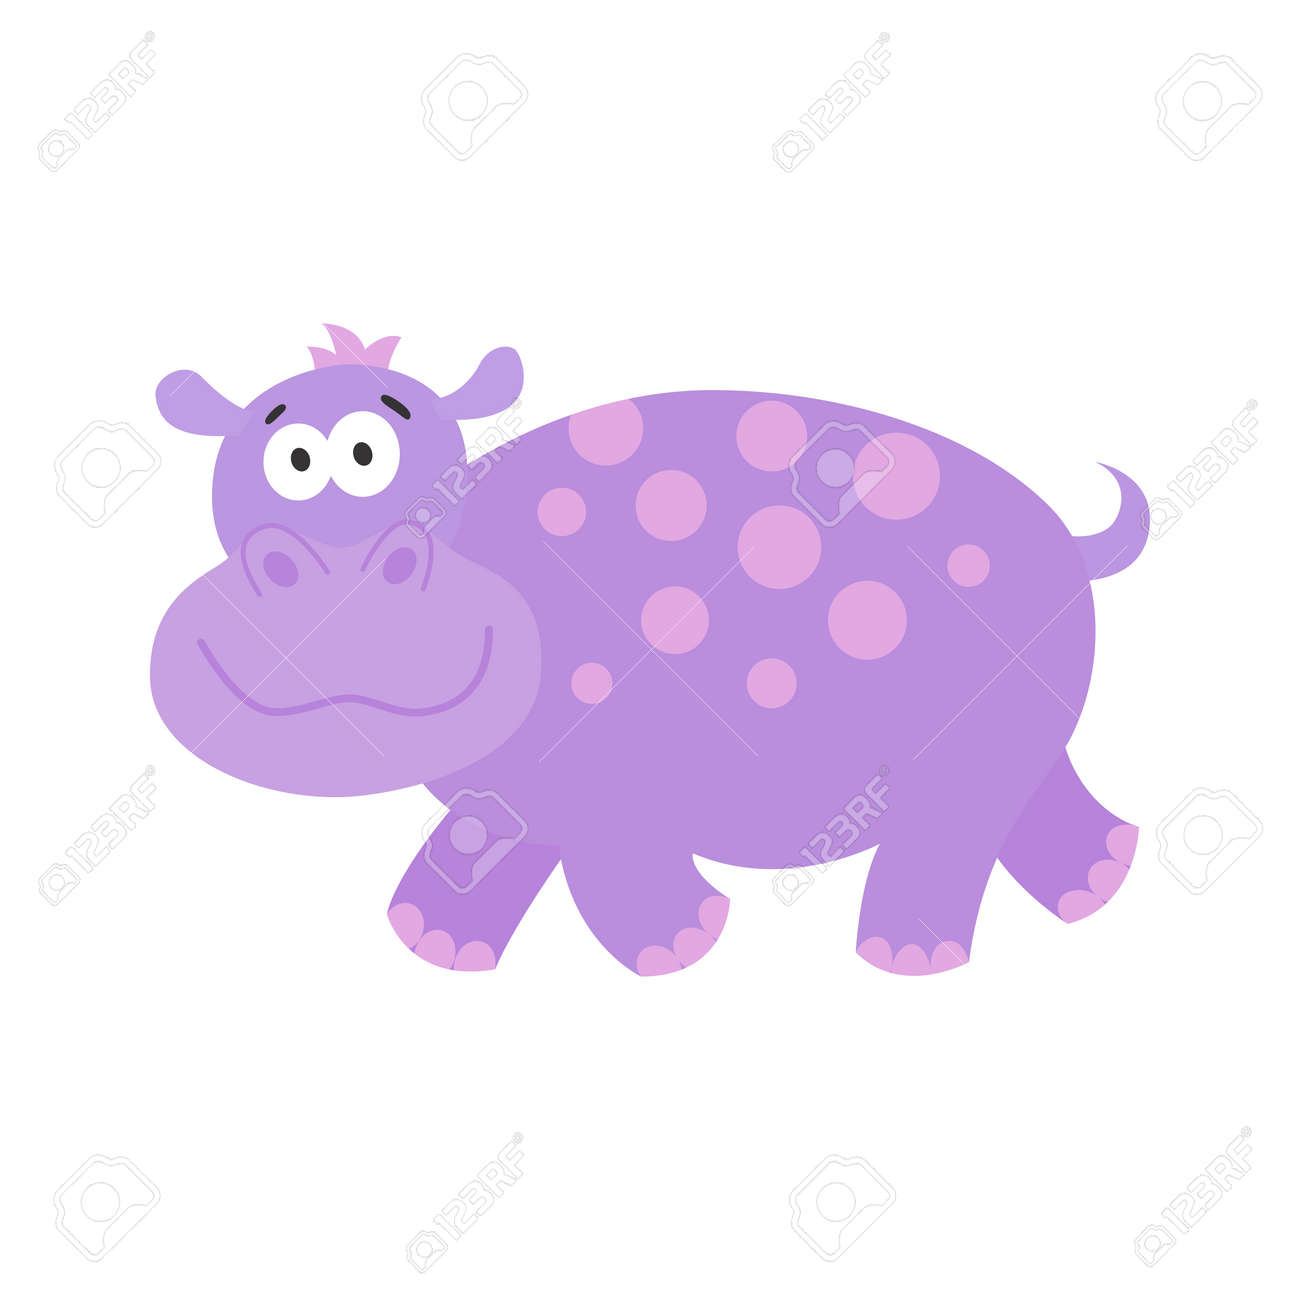 Drôle Hippo.Cute Dessin Animé Animal Africain. Béhémoth De Vecteur ...